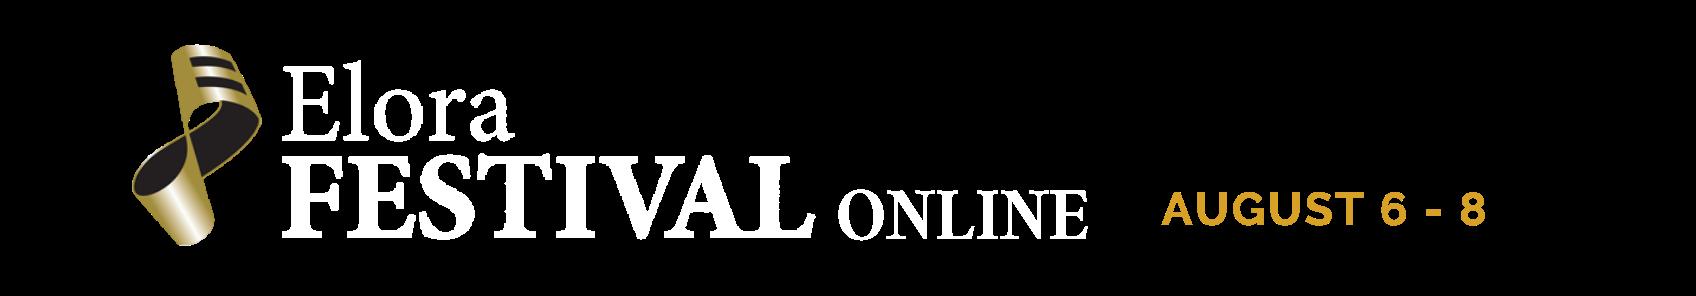 Elora Festival Online August 6 - 8